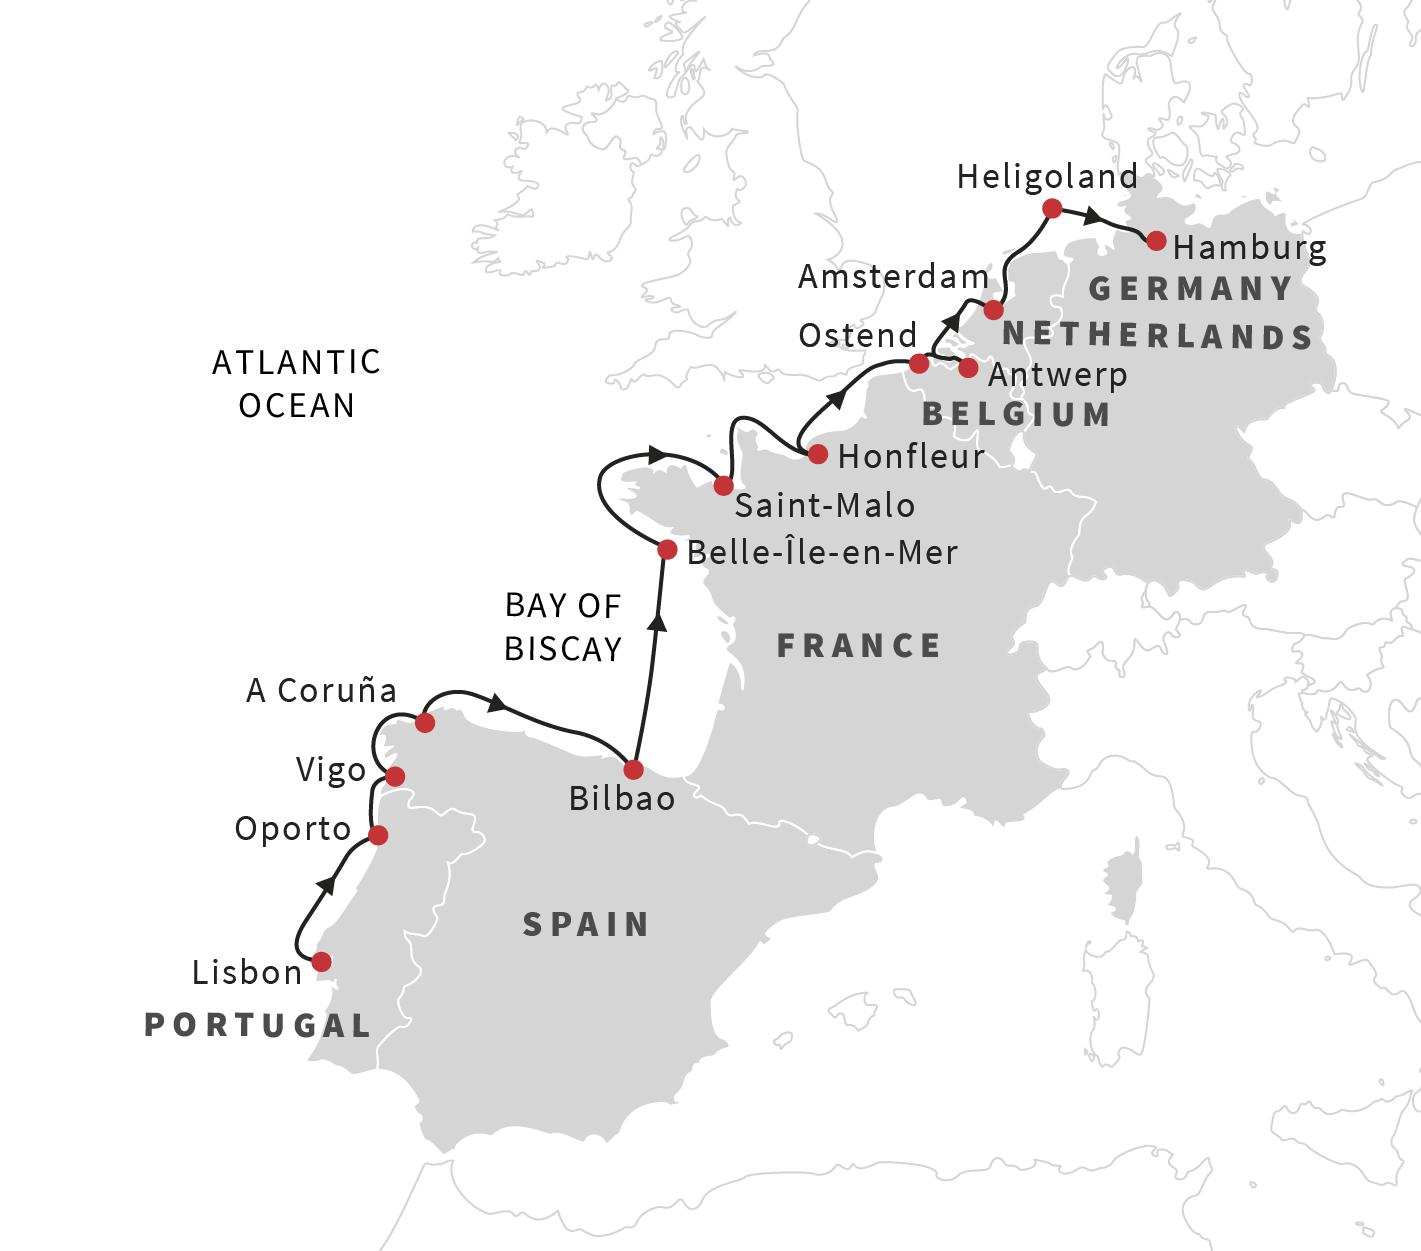 Cruise the European Coast: From Lisbon to Hamburg - May 2019 ...